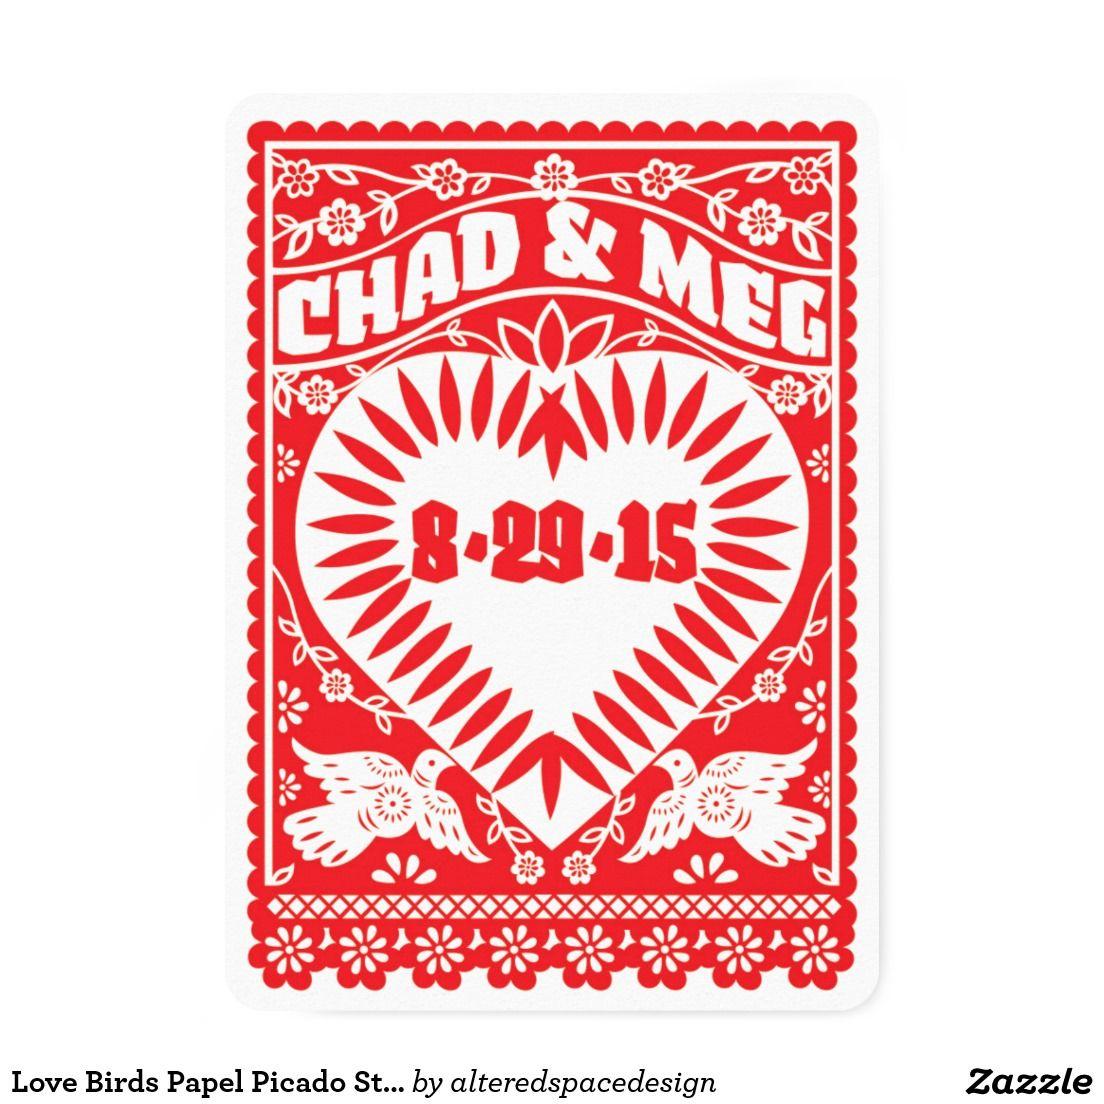 Love Birds Papel Picado Style Fan | Pinterest | Papel picado and ...